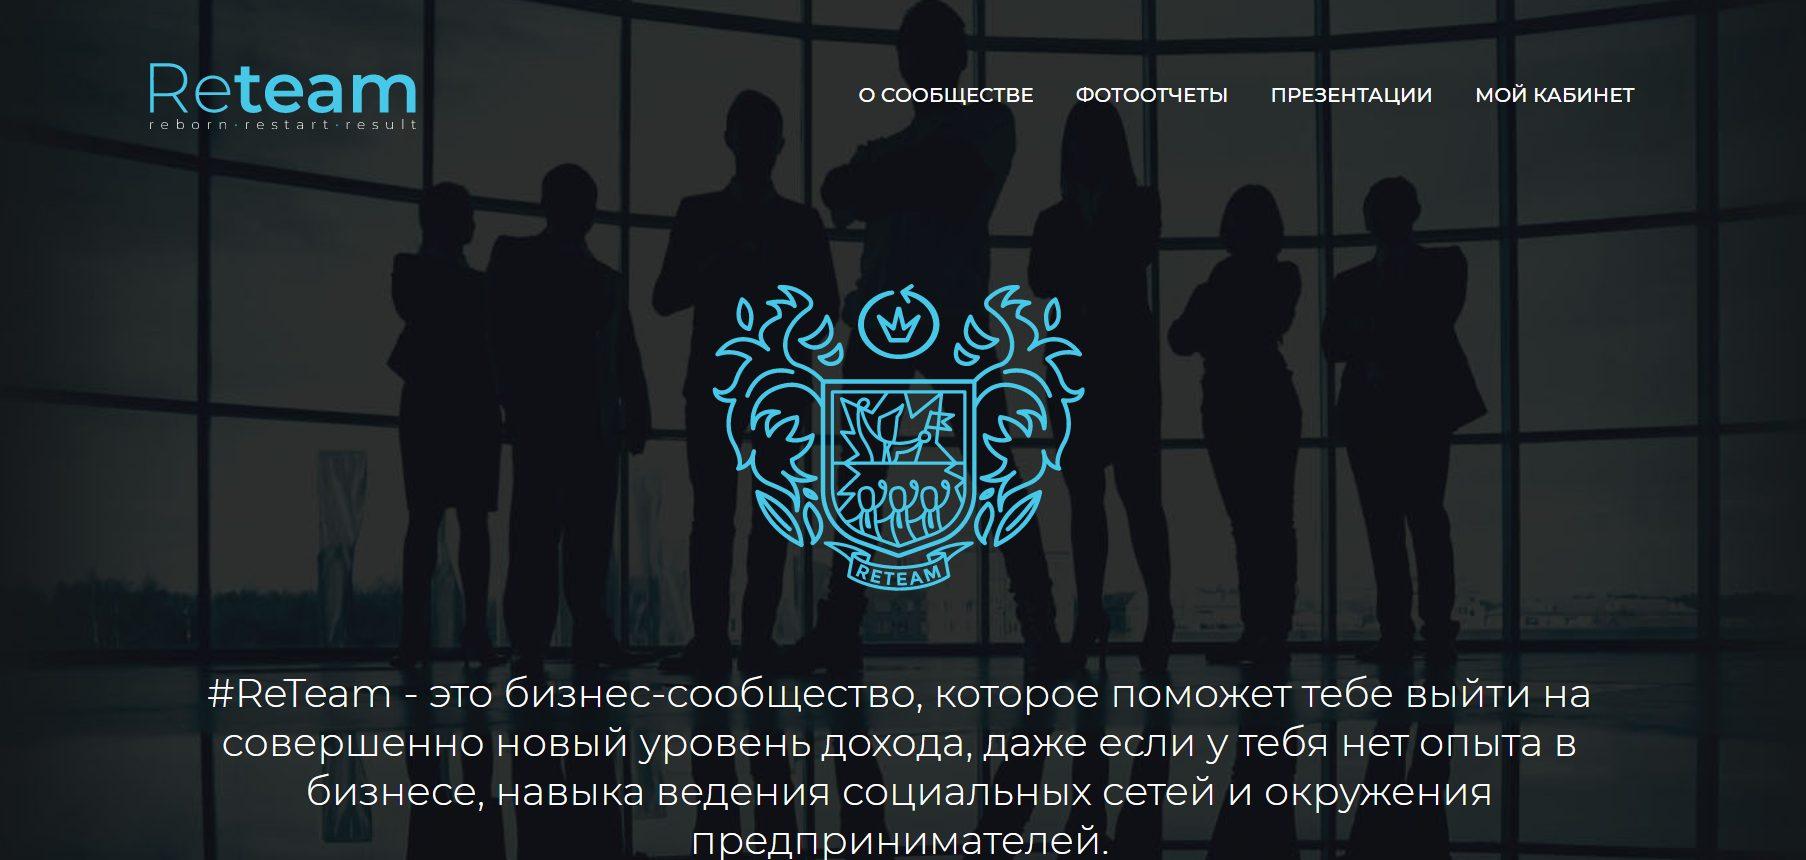 Главная страница сайта ReTeam